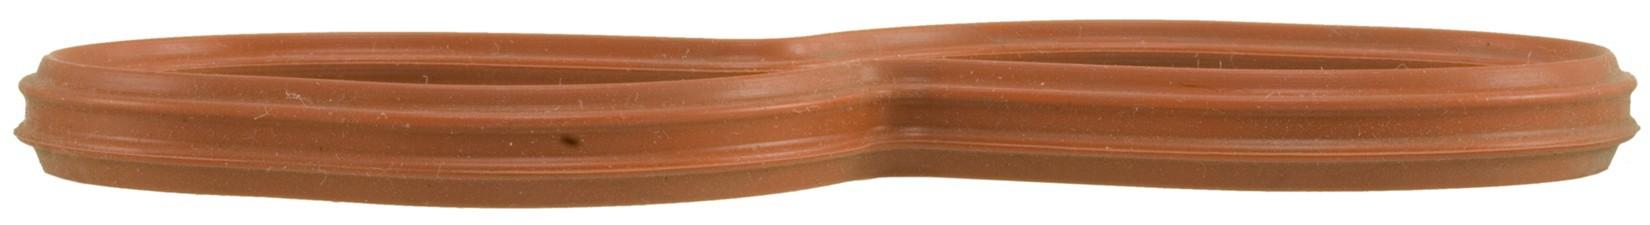 AIRTEX ENG. MGMT. SYSTEMS - Fuel Injection Plenum Gasket (Upper) - AEM 1G1116